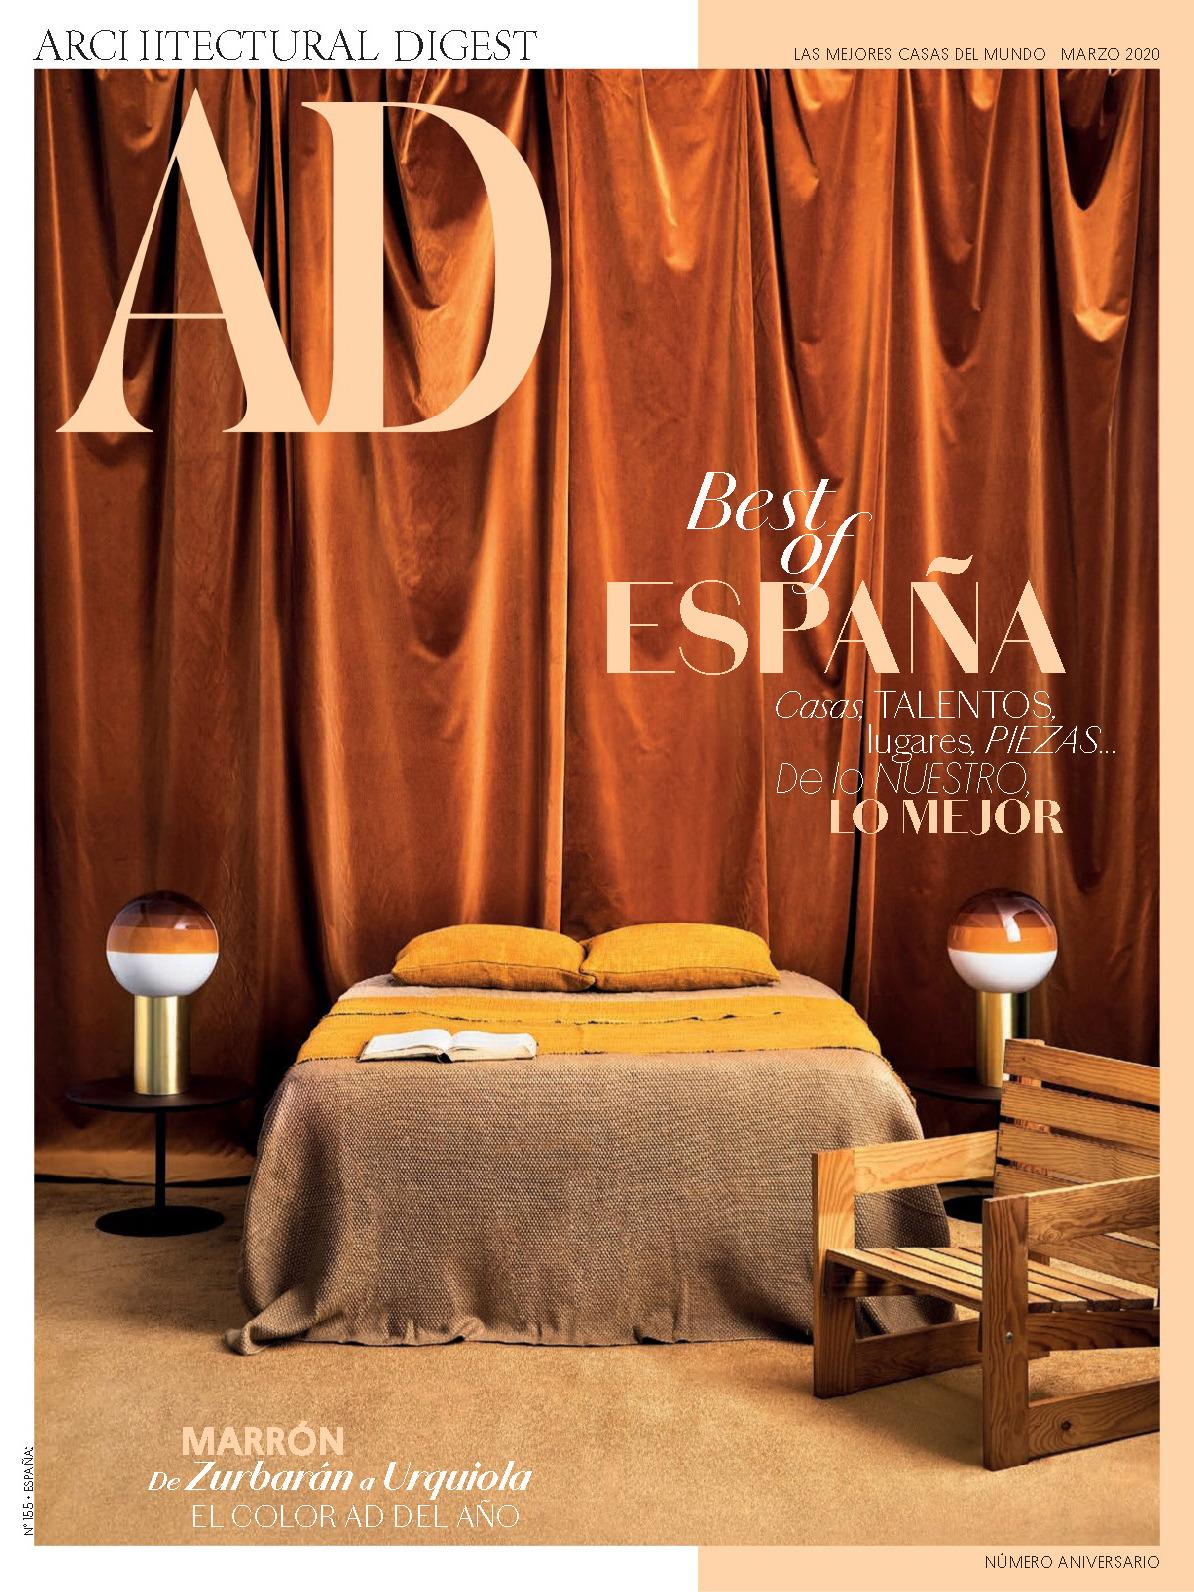 《AD》西班牙版室内室外设计杂志2020年03月号